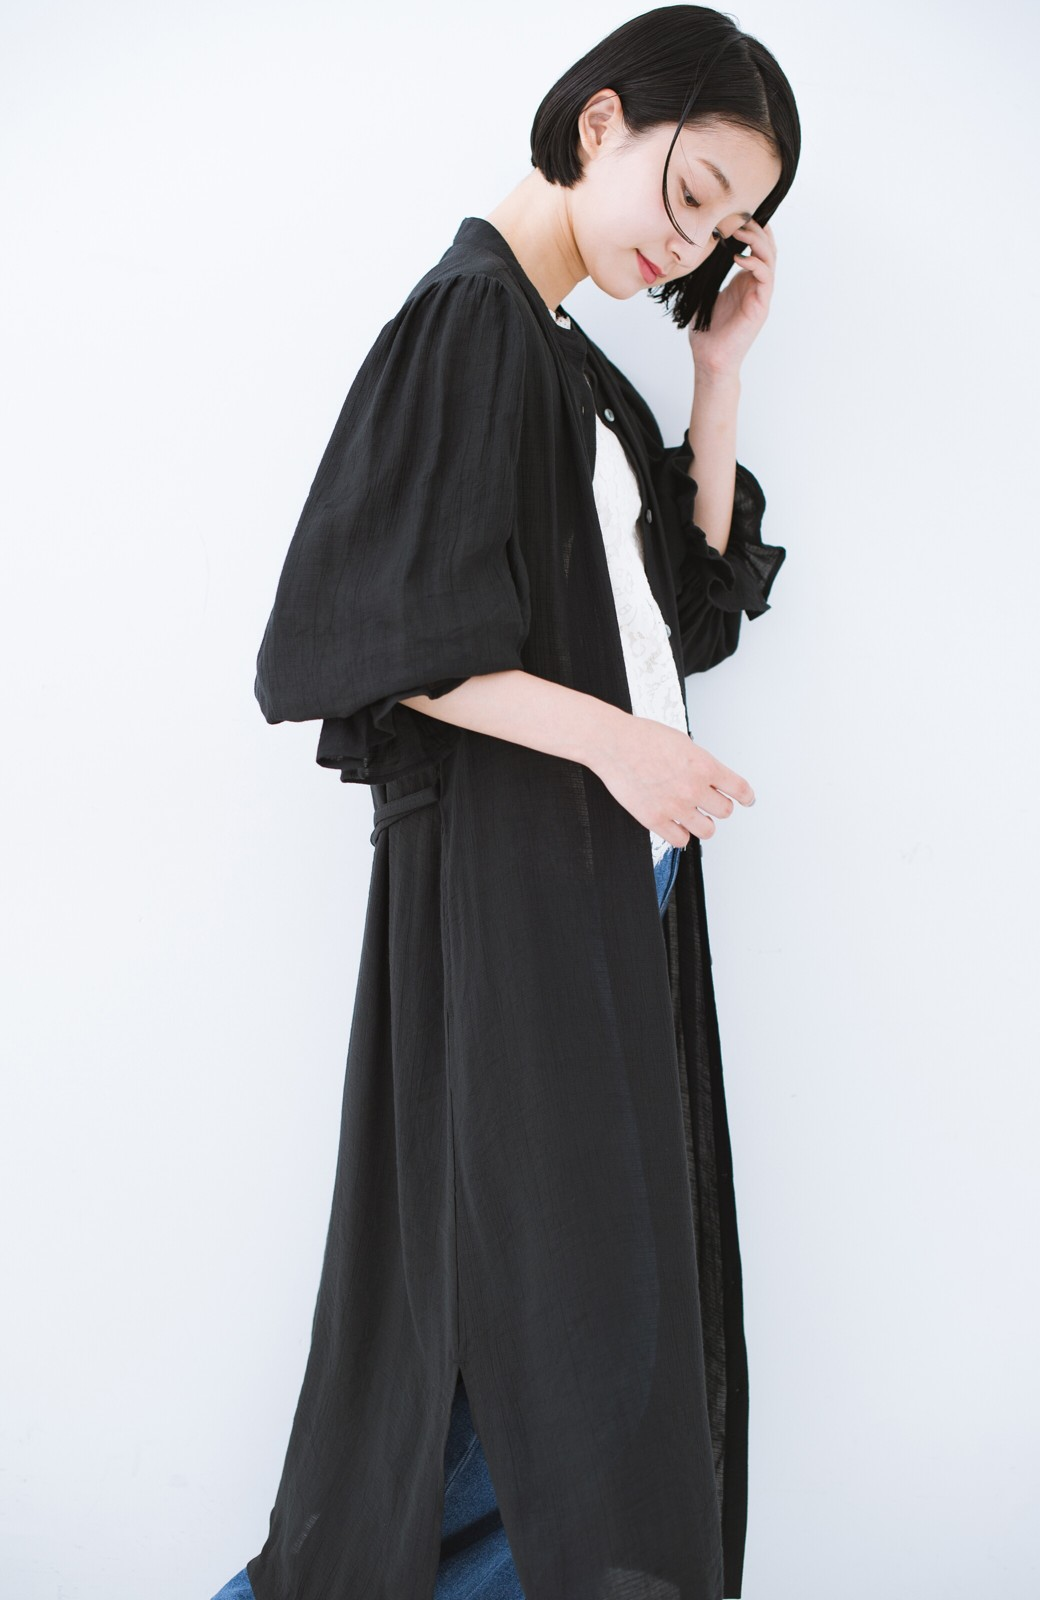 haco! 太ってもばれず 羽織っても便利なウエストリボンワンピース <ブラック>の商品写真23